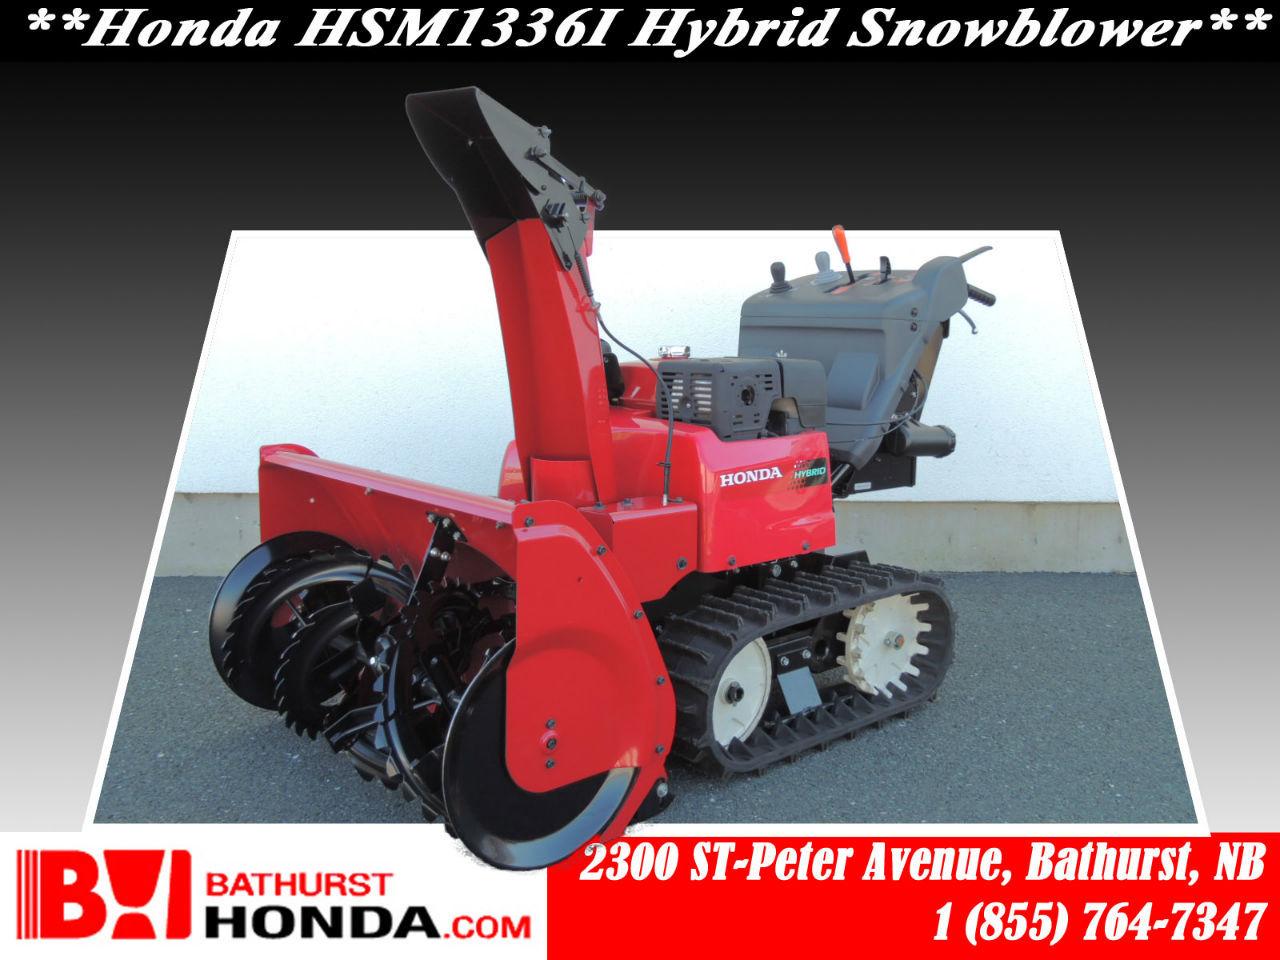 honda power videos equipment blower prod product snow blowers